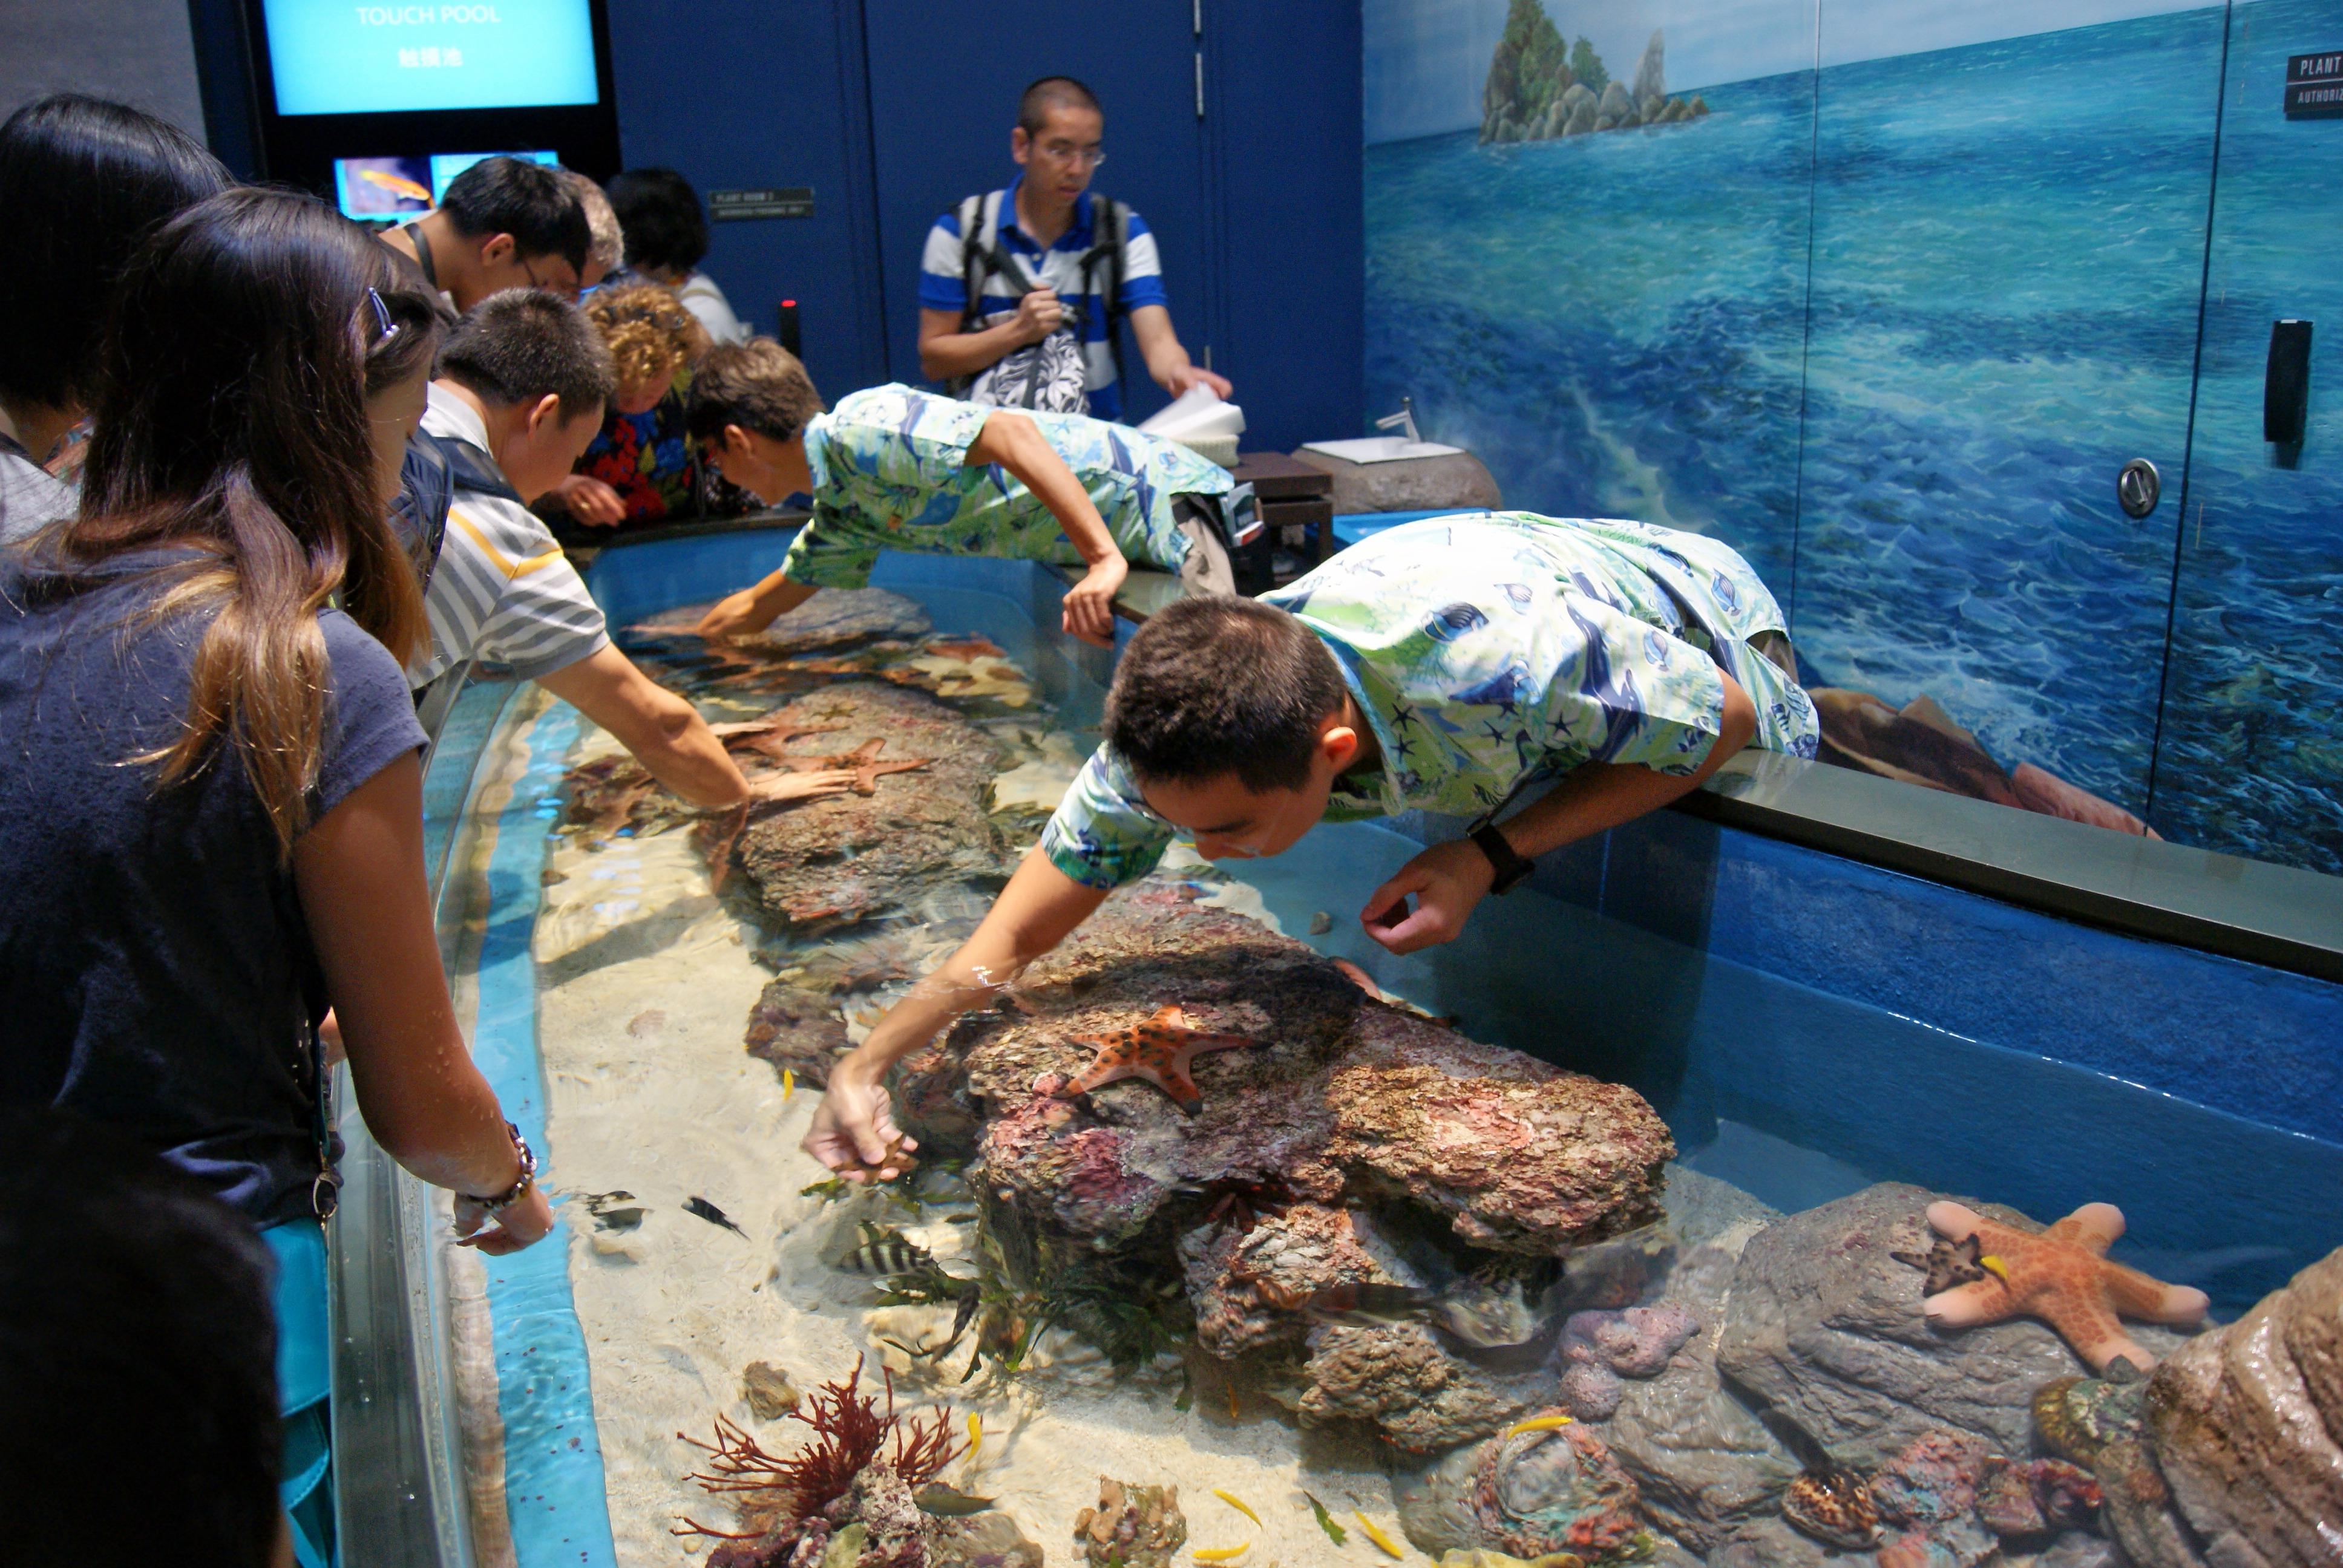 1465794073_discovery_touch_pool__s.e.a._aquarium__marine_life_park__resorts_world_sentosa__singapore_-_20130105-01.jpg